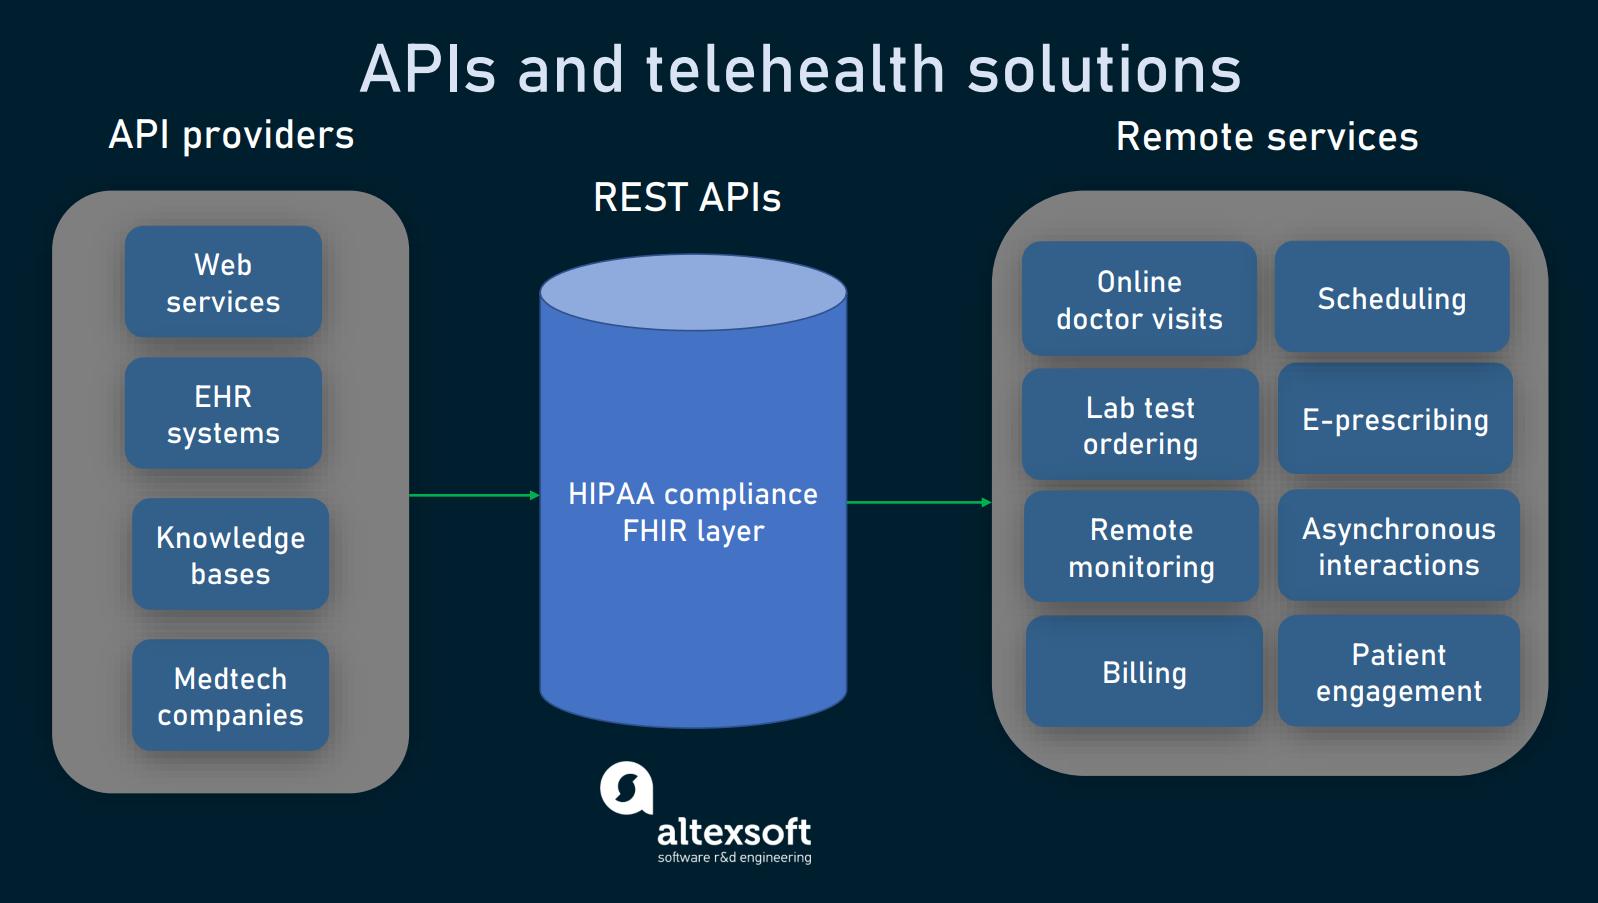 APIs for telehealth solutions